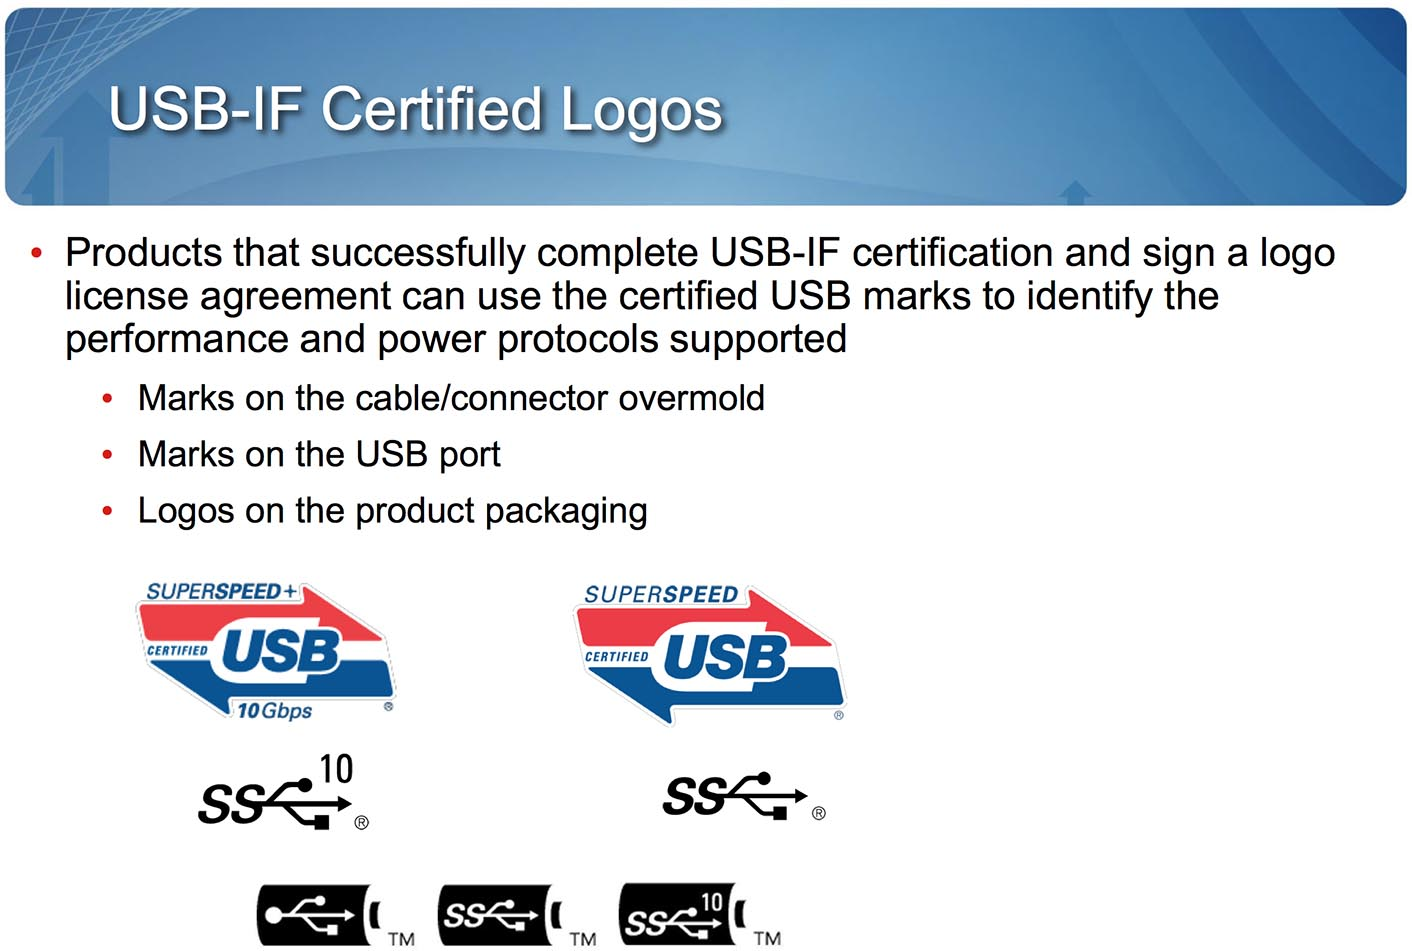 USB 3.1 Logos